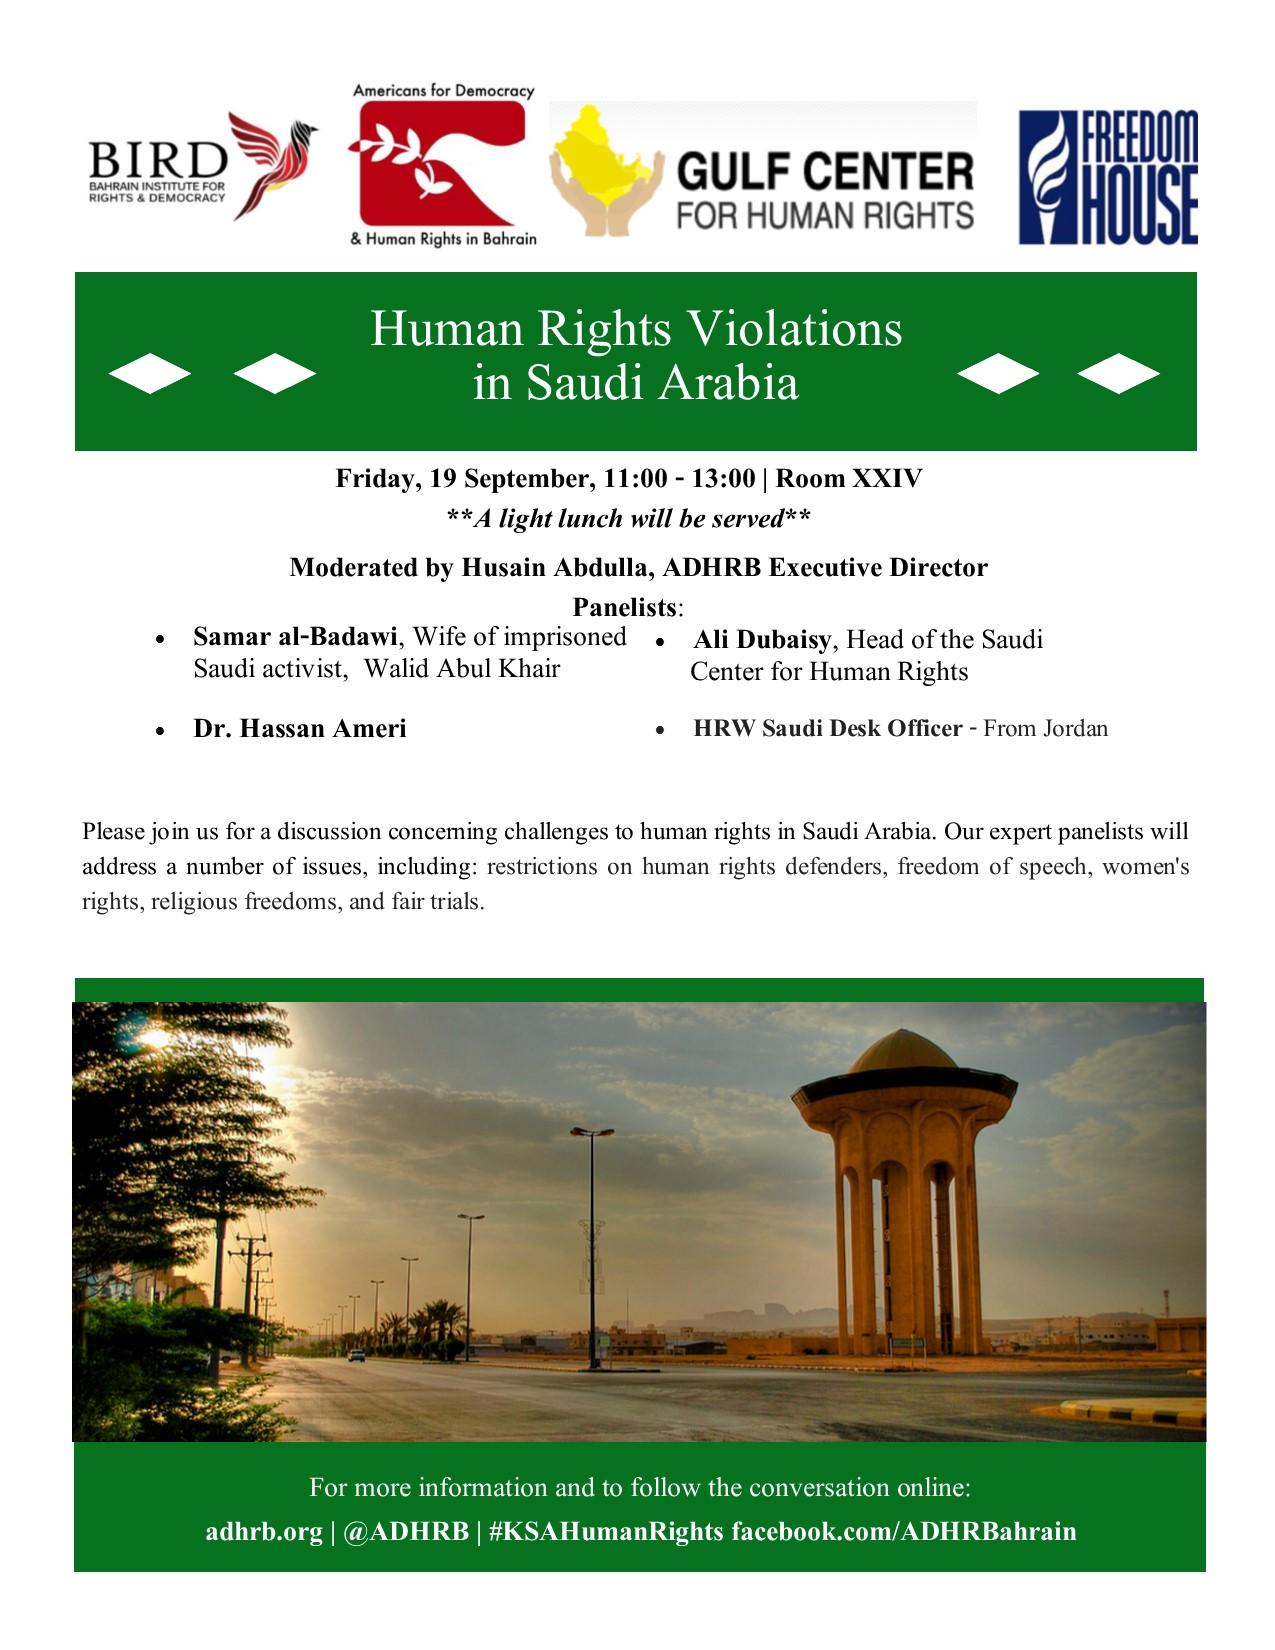 Human Rights Violations in Saudi Arabia_flyer